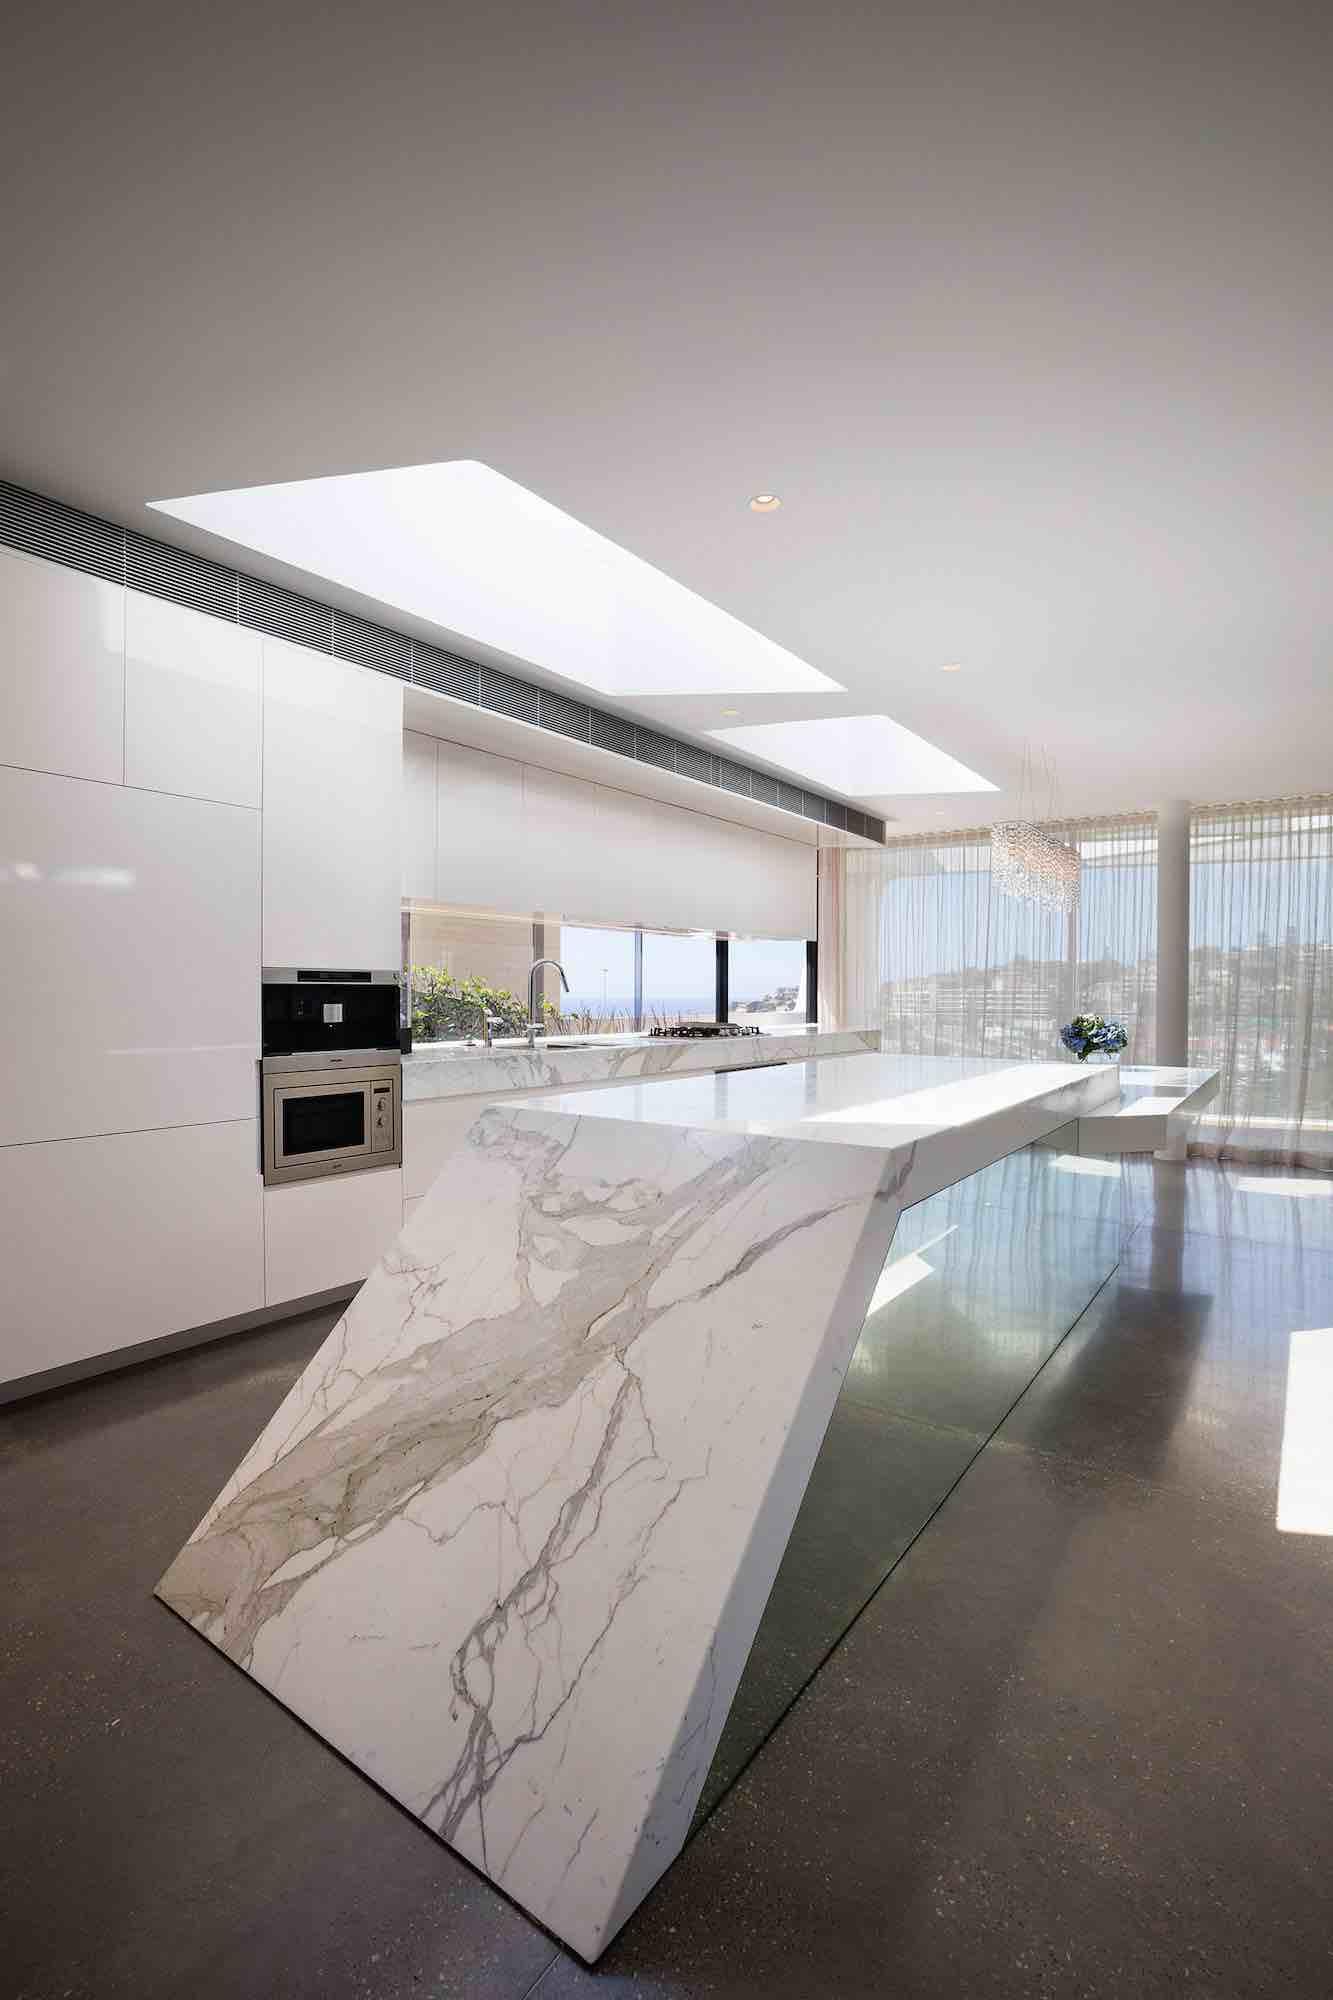 hewlett-street-house-mpr-design-group_hewlett_house21